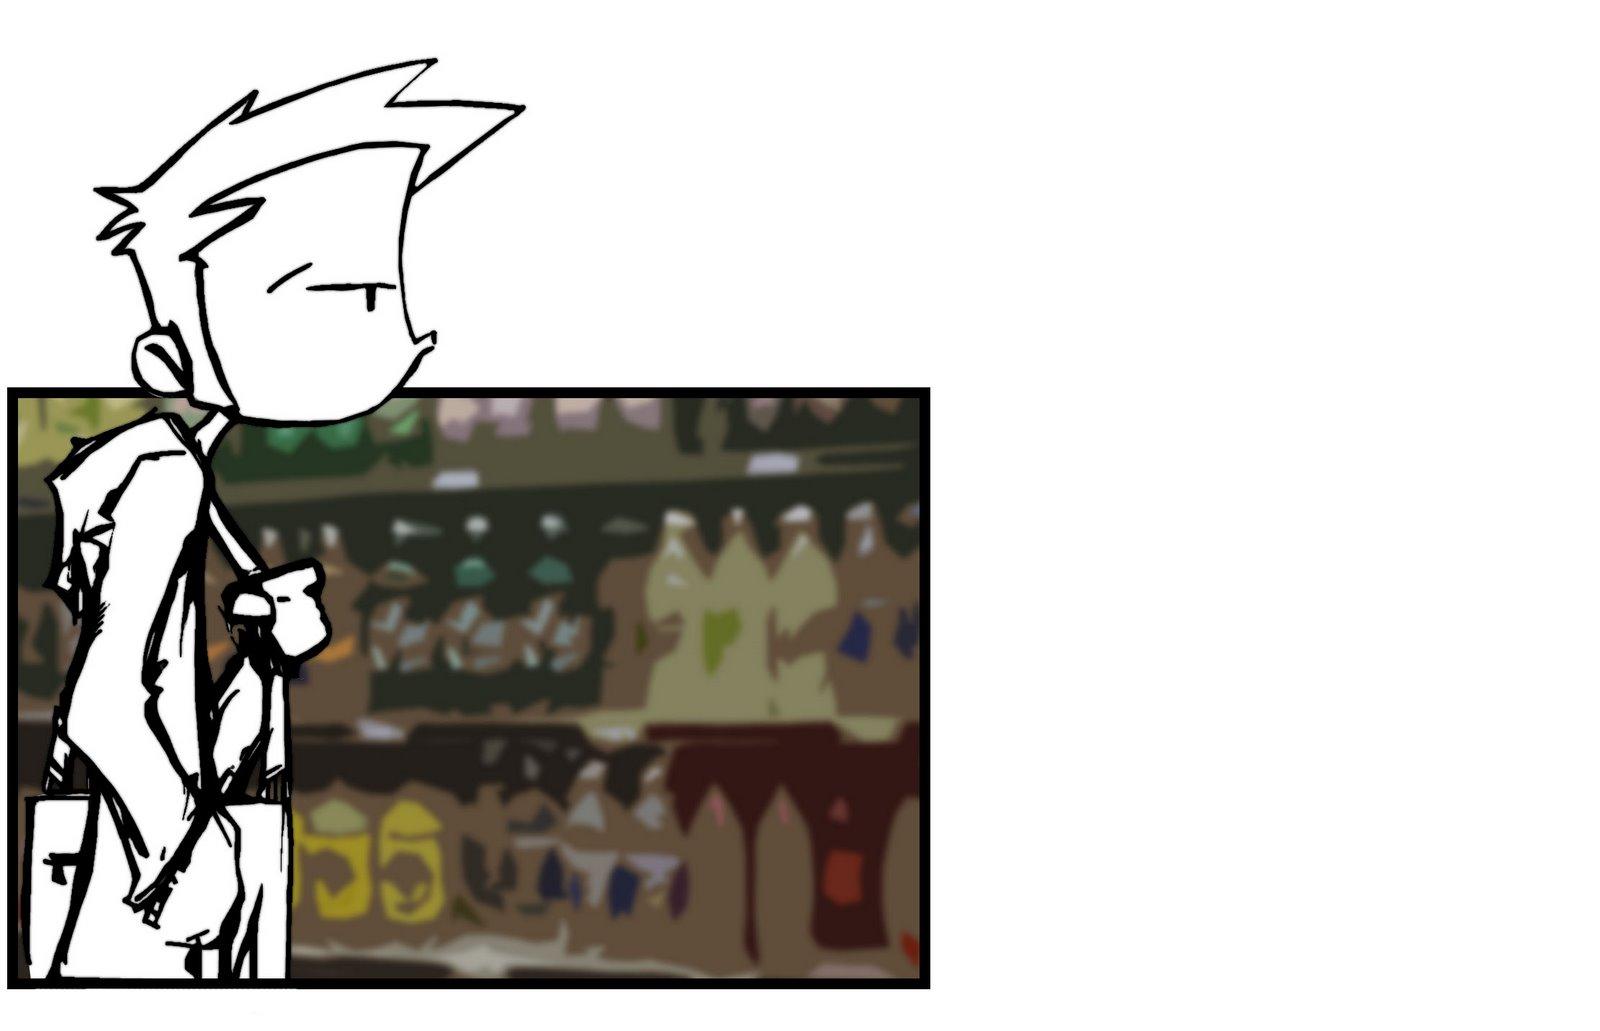 [figure.jpg]